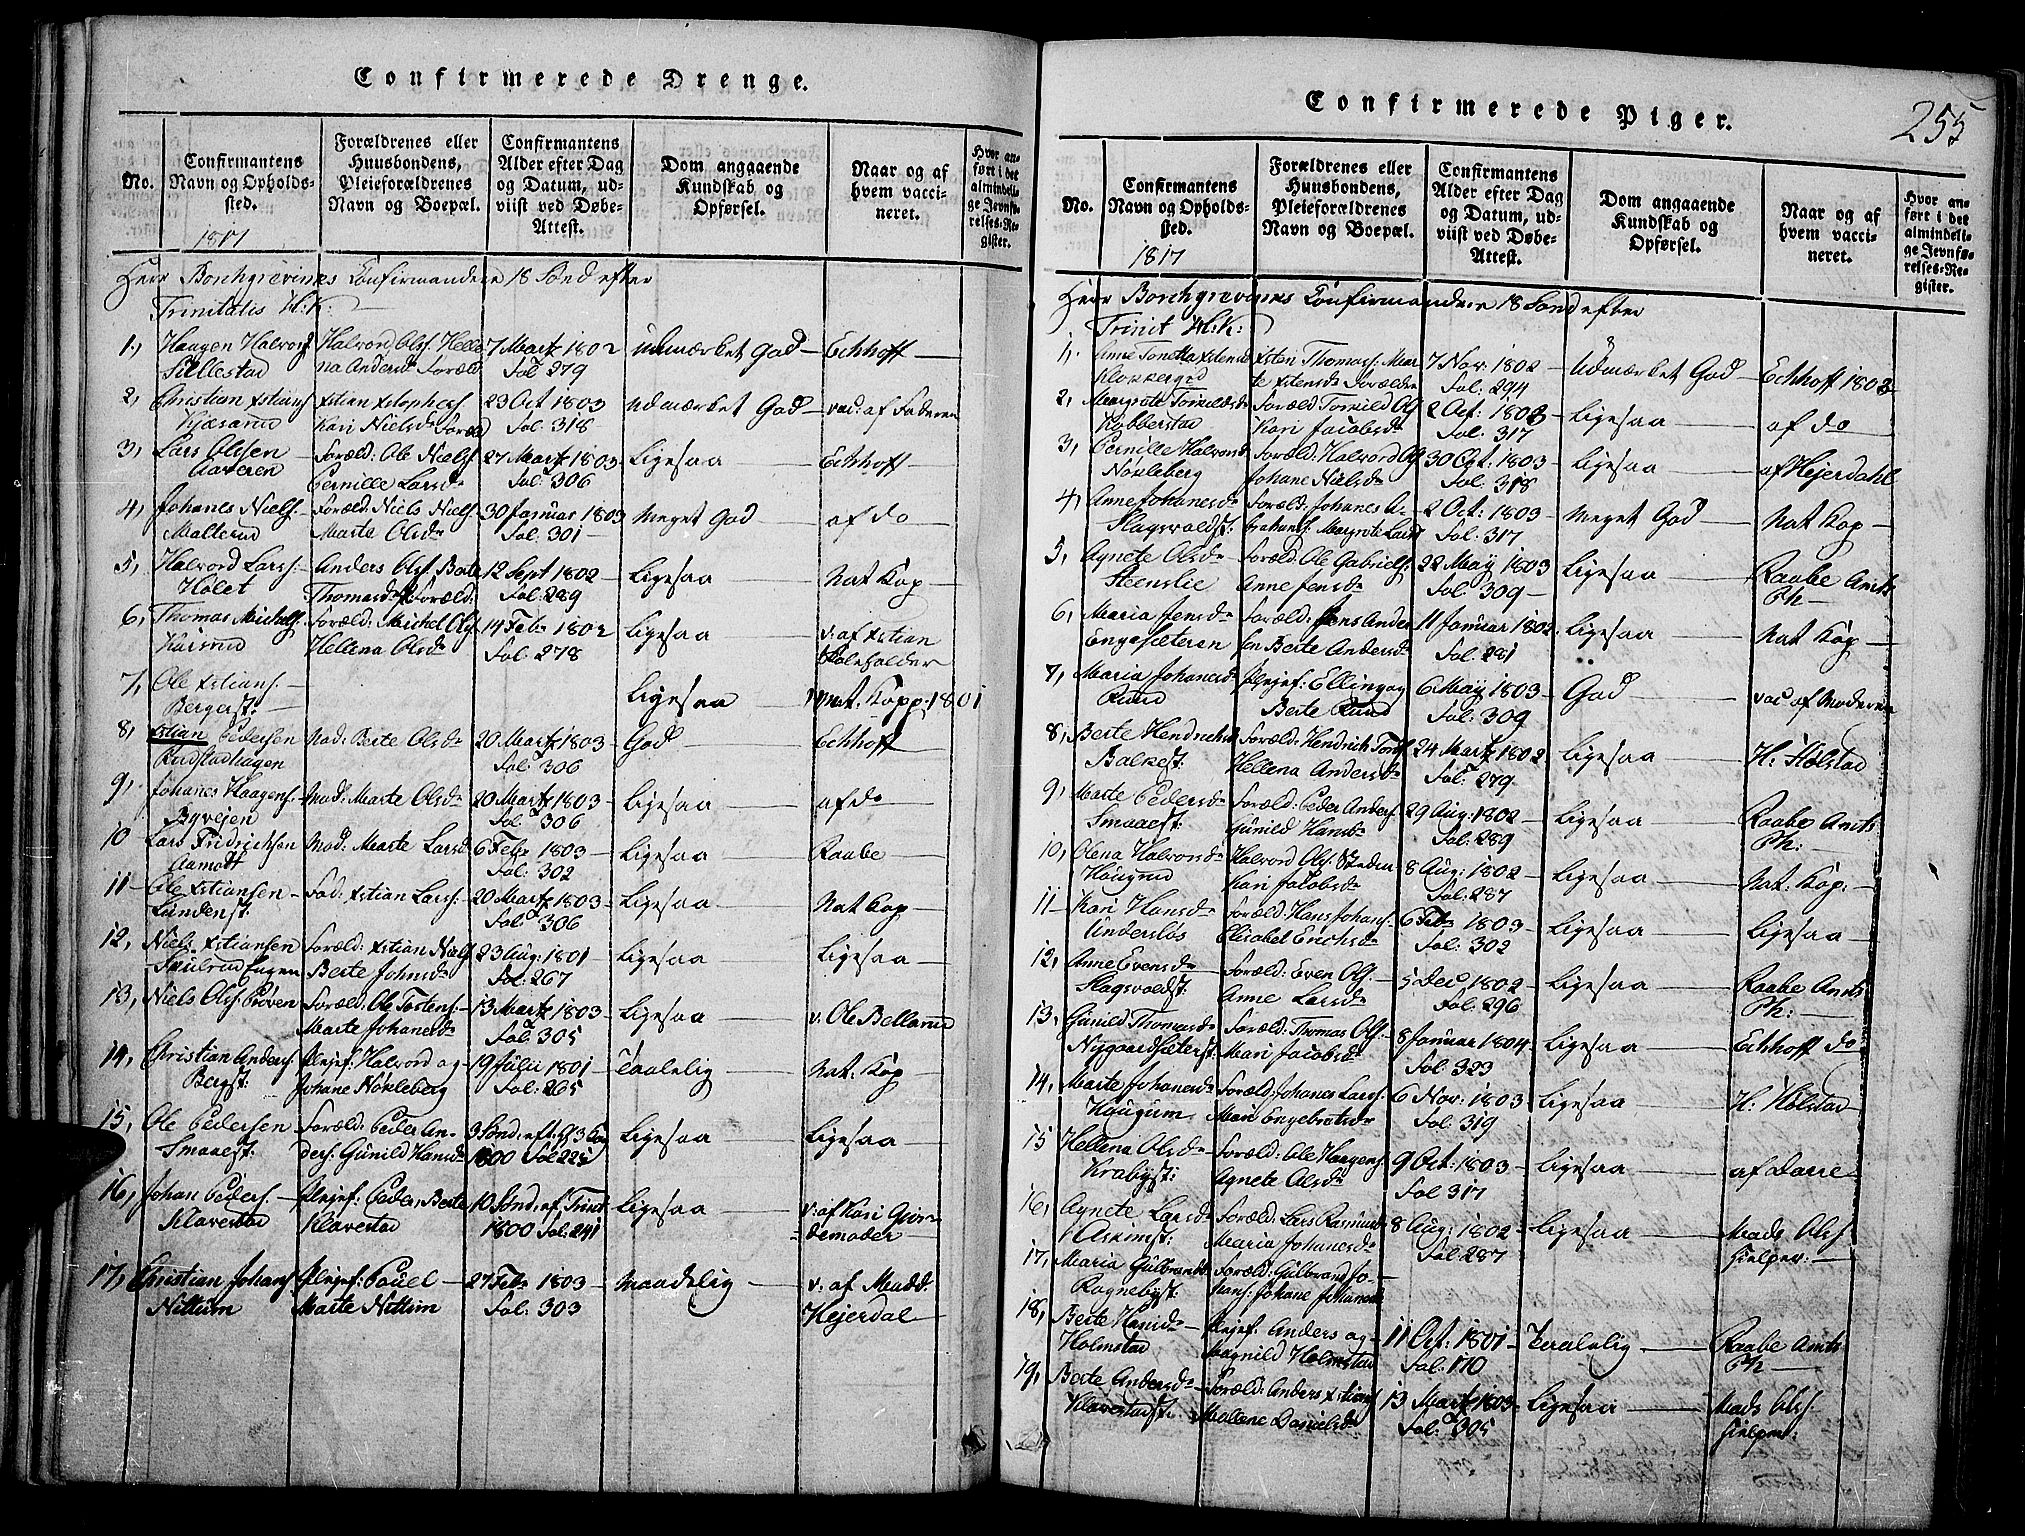 SAH, Toten prestekontor, Ministerialbok nr. 9, 1814-1820, s. 255